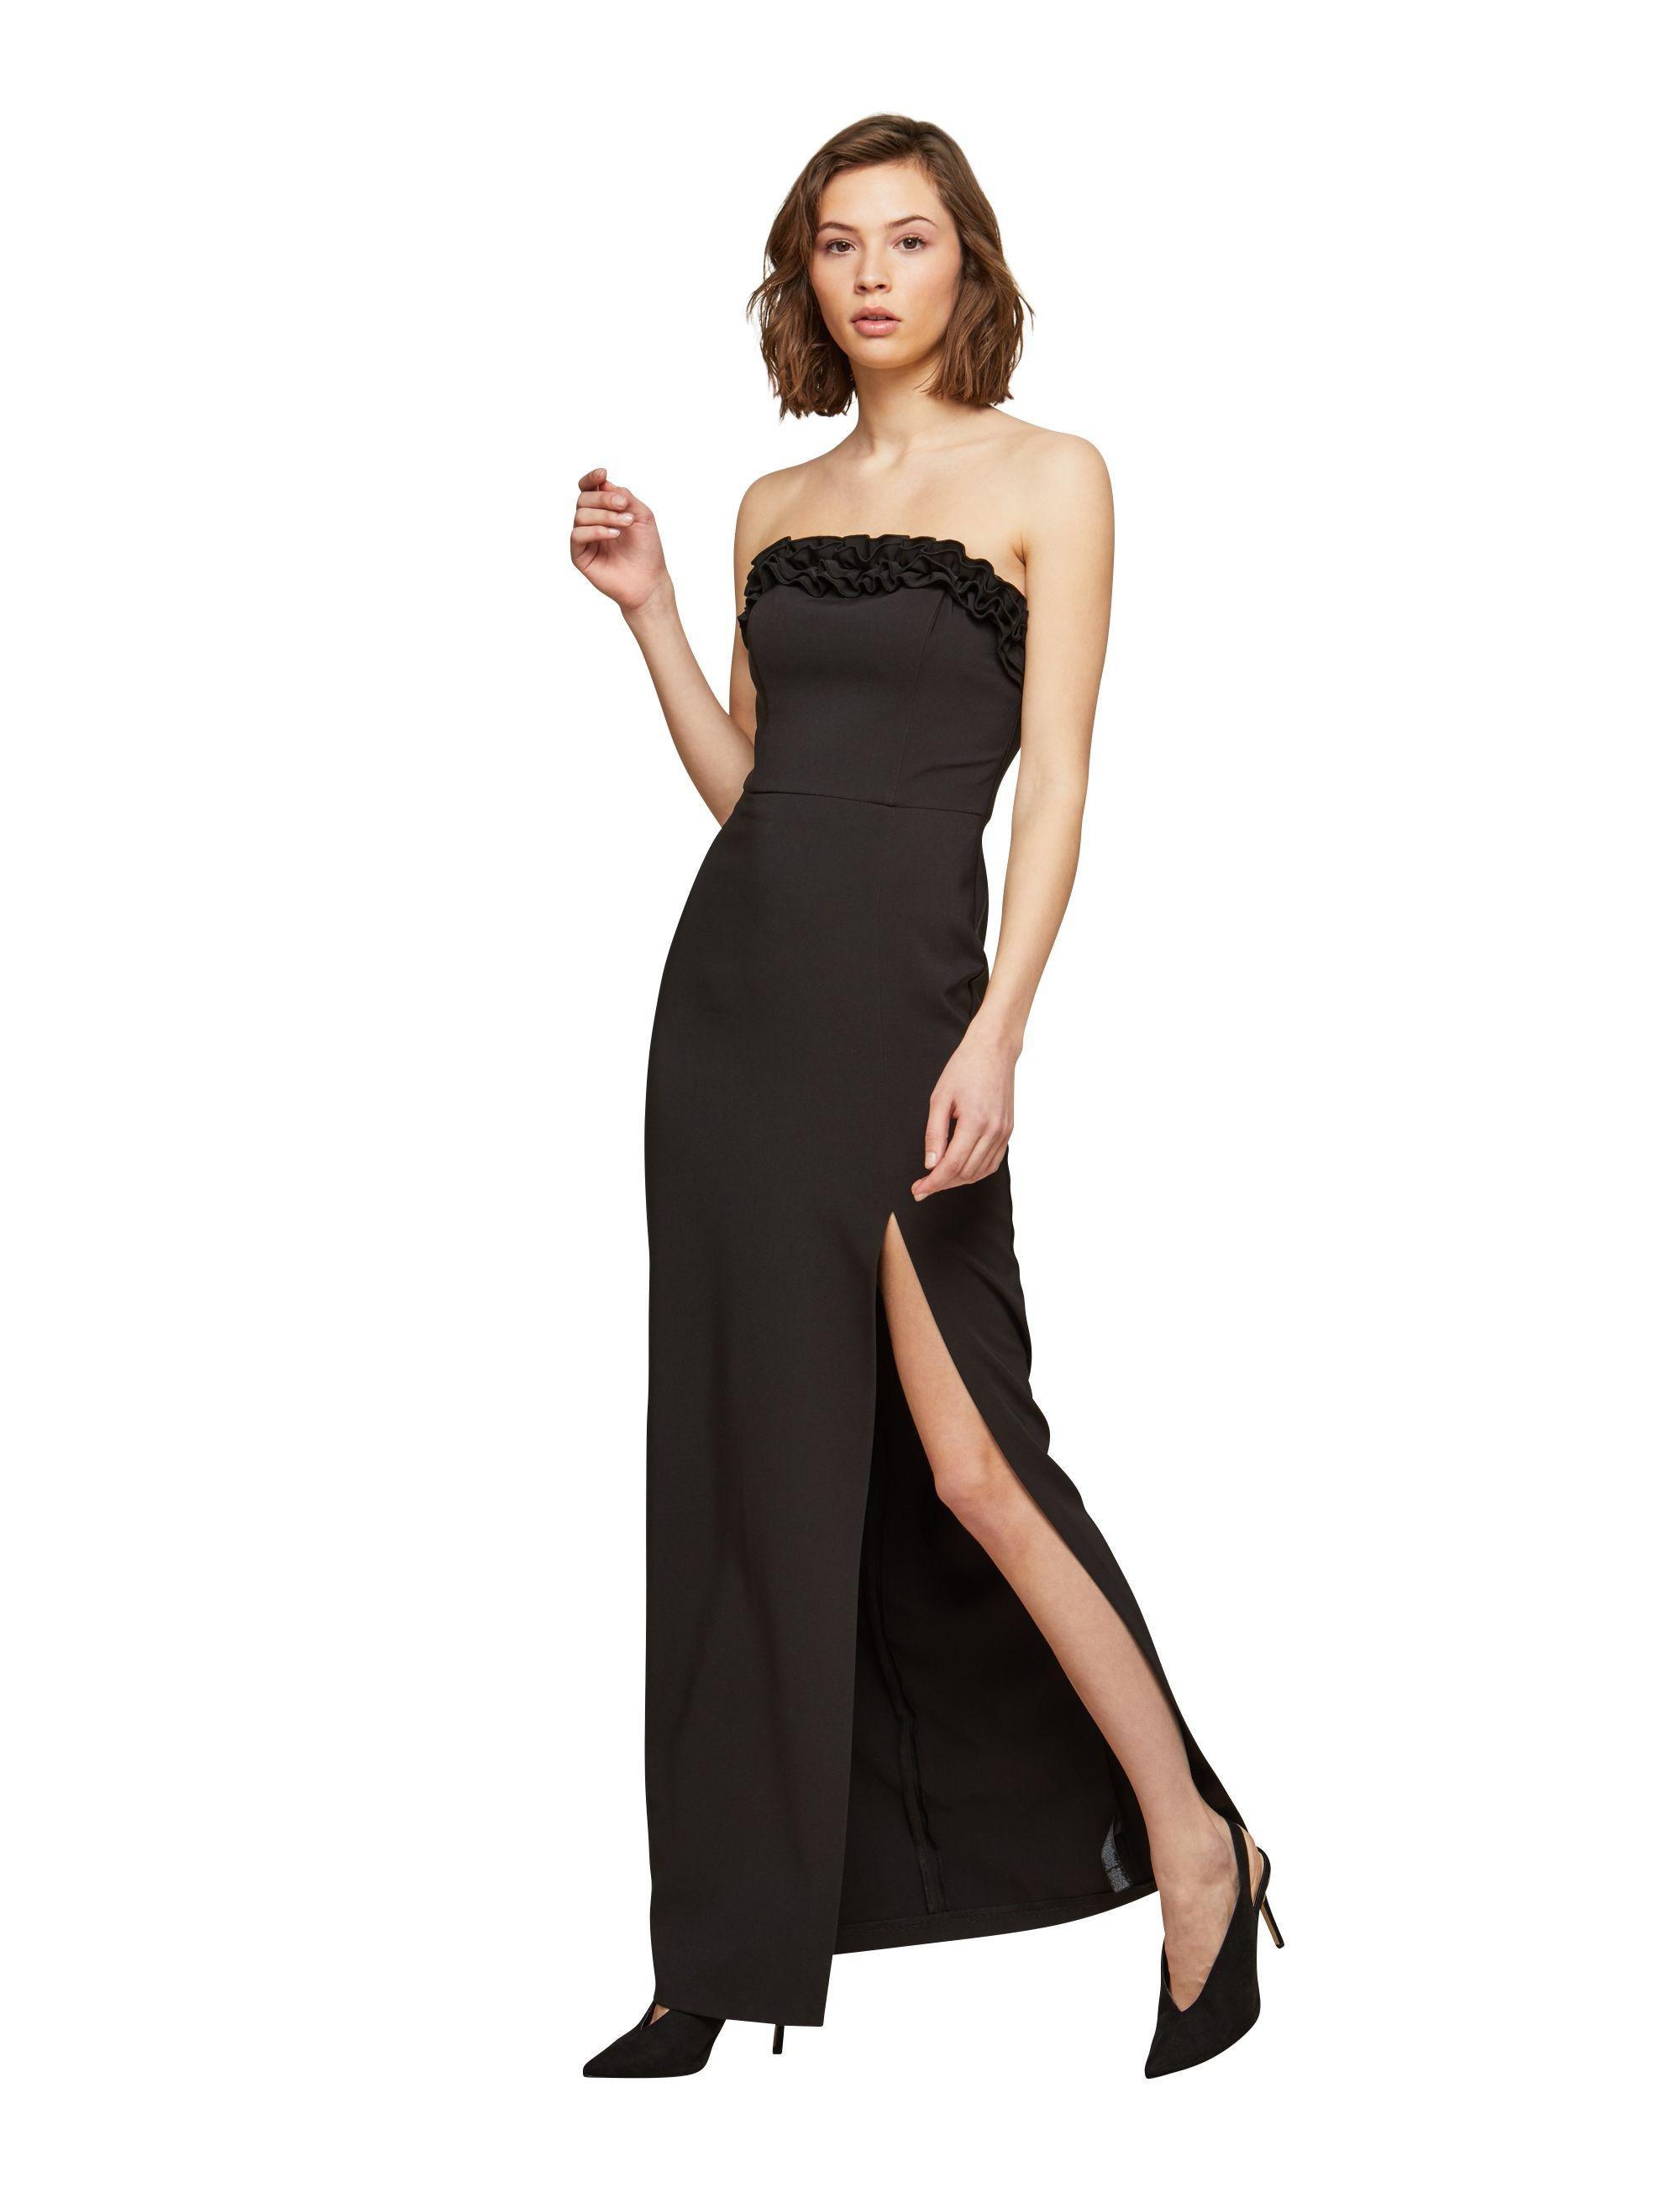 85b4537901e6 Gallery. Previously sold at: Debenhams · Women's Bandeau Dresses Women's Prom  Dresses